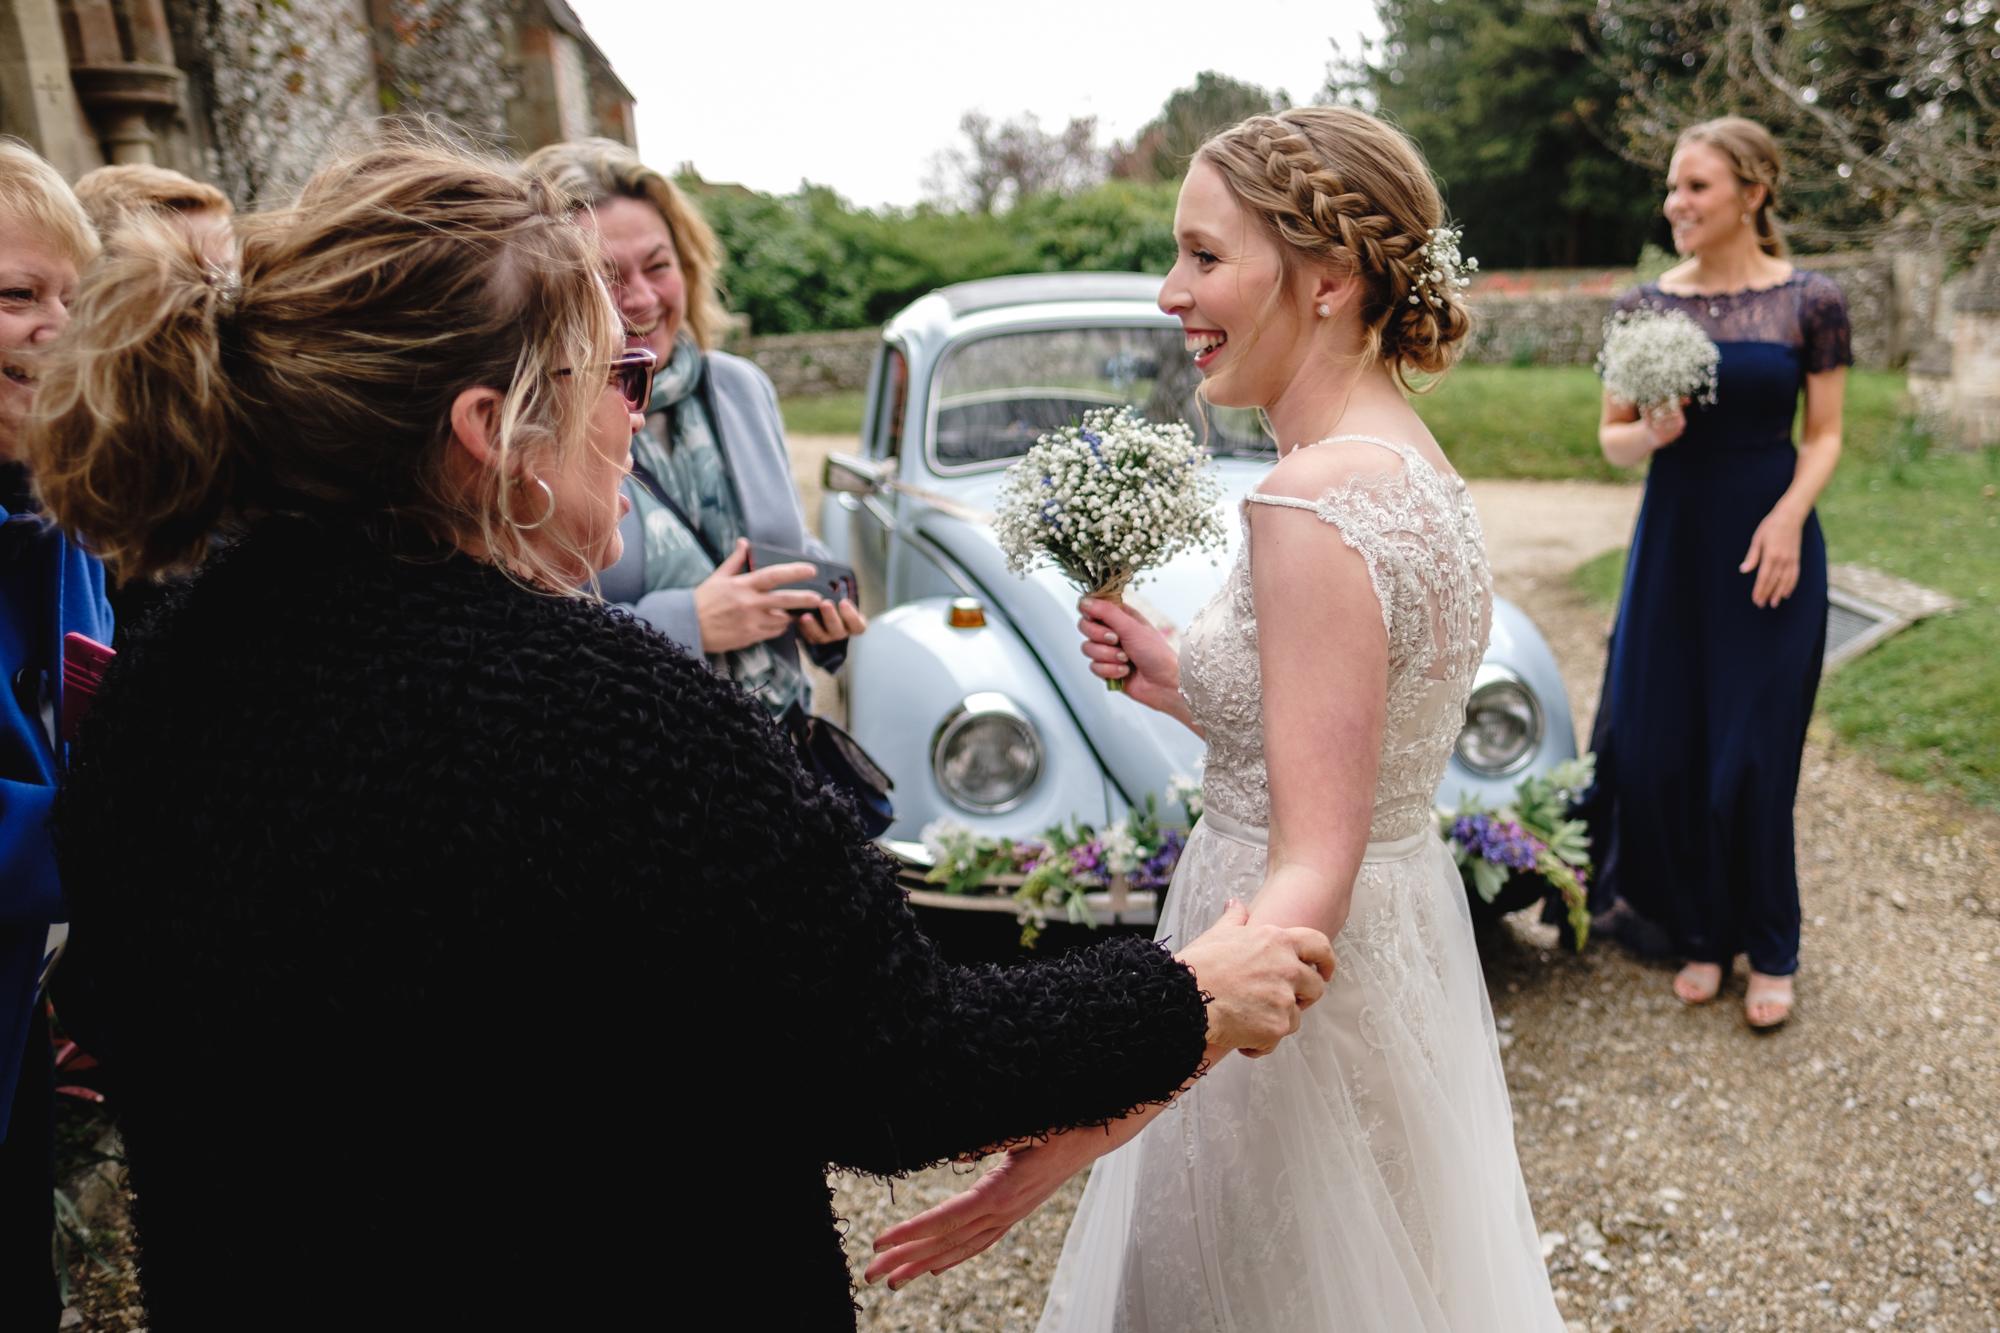 Katie and Dode weddings (31 of 207).jpg